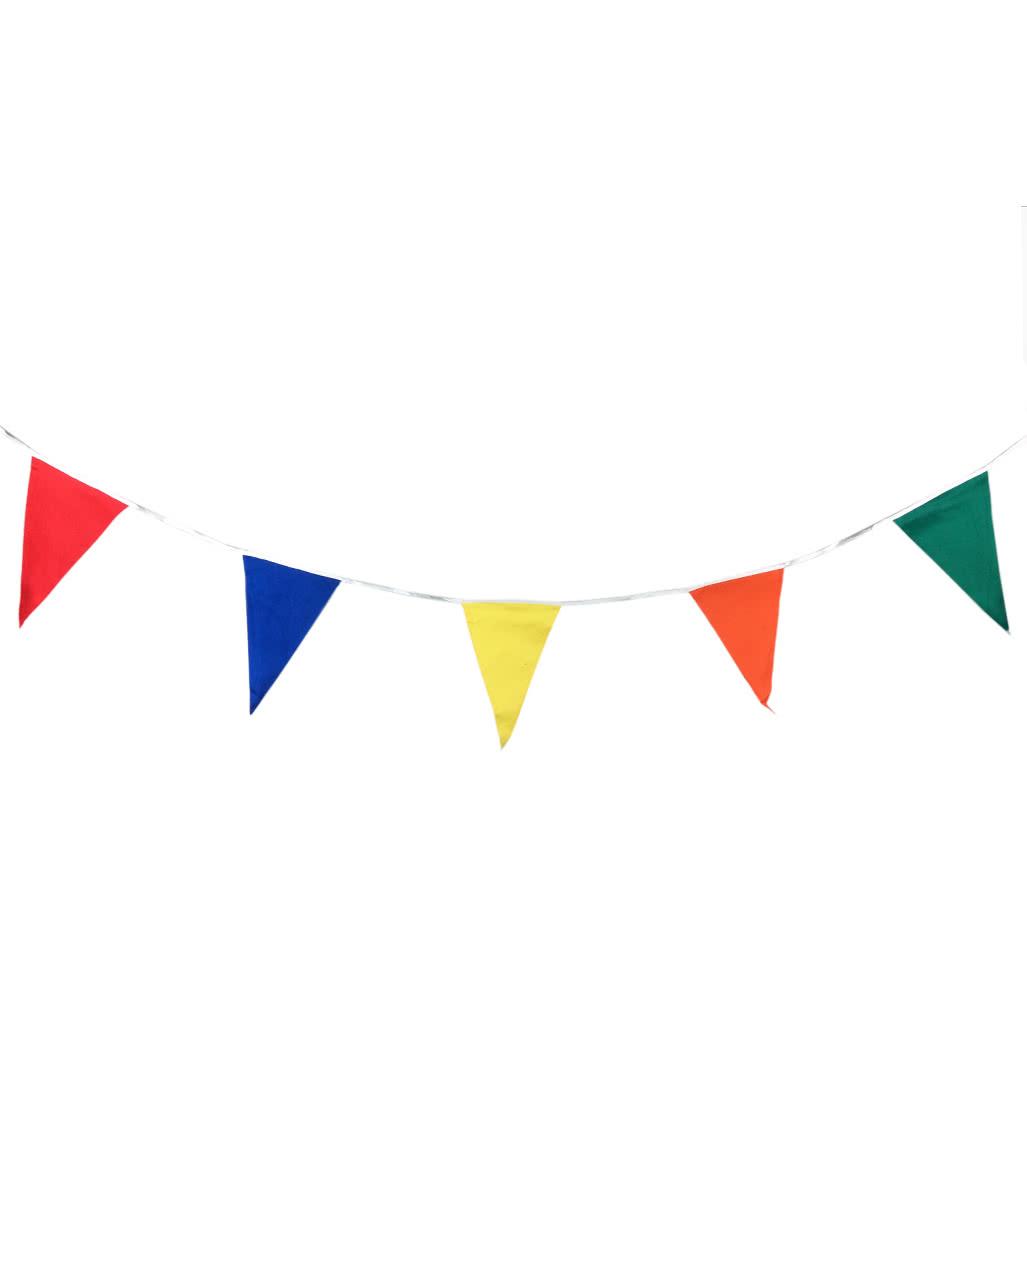 Wimpelkette Fahne Flagge Fahnenkette Girlande Wimpel Länder Fahnengirlande